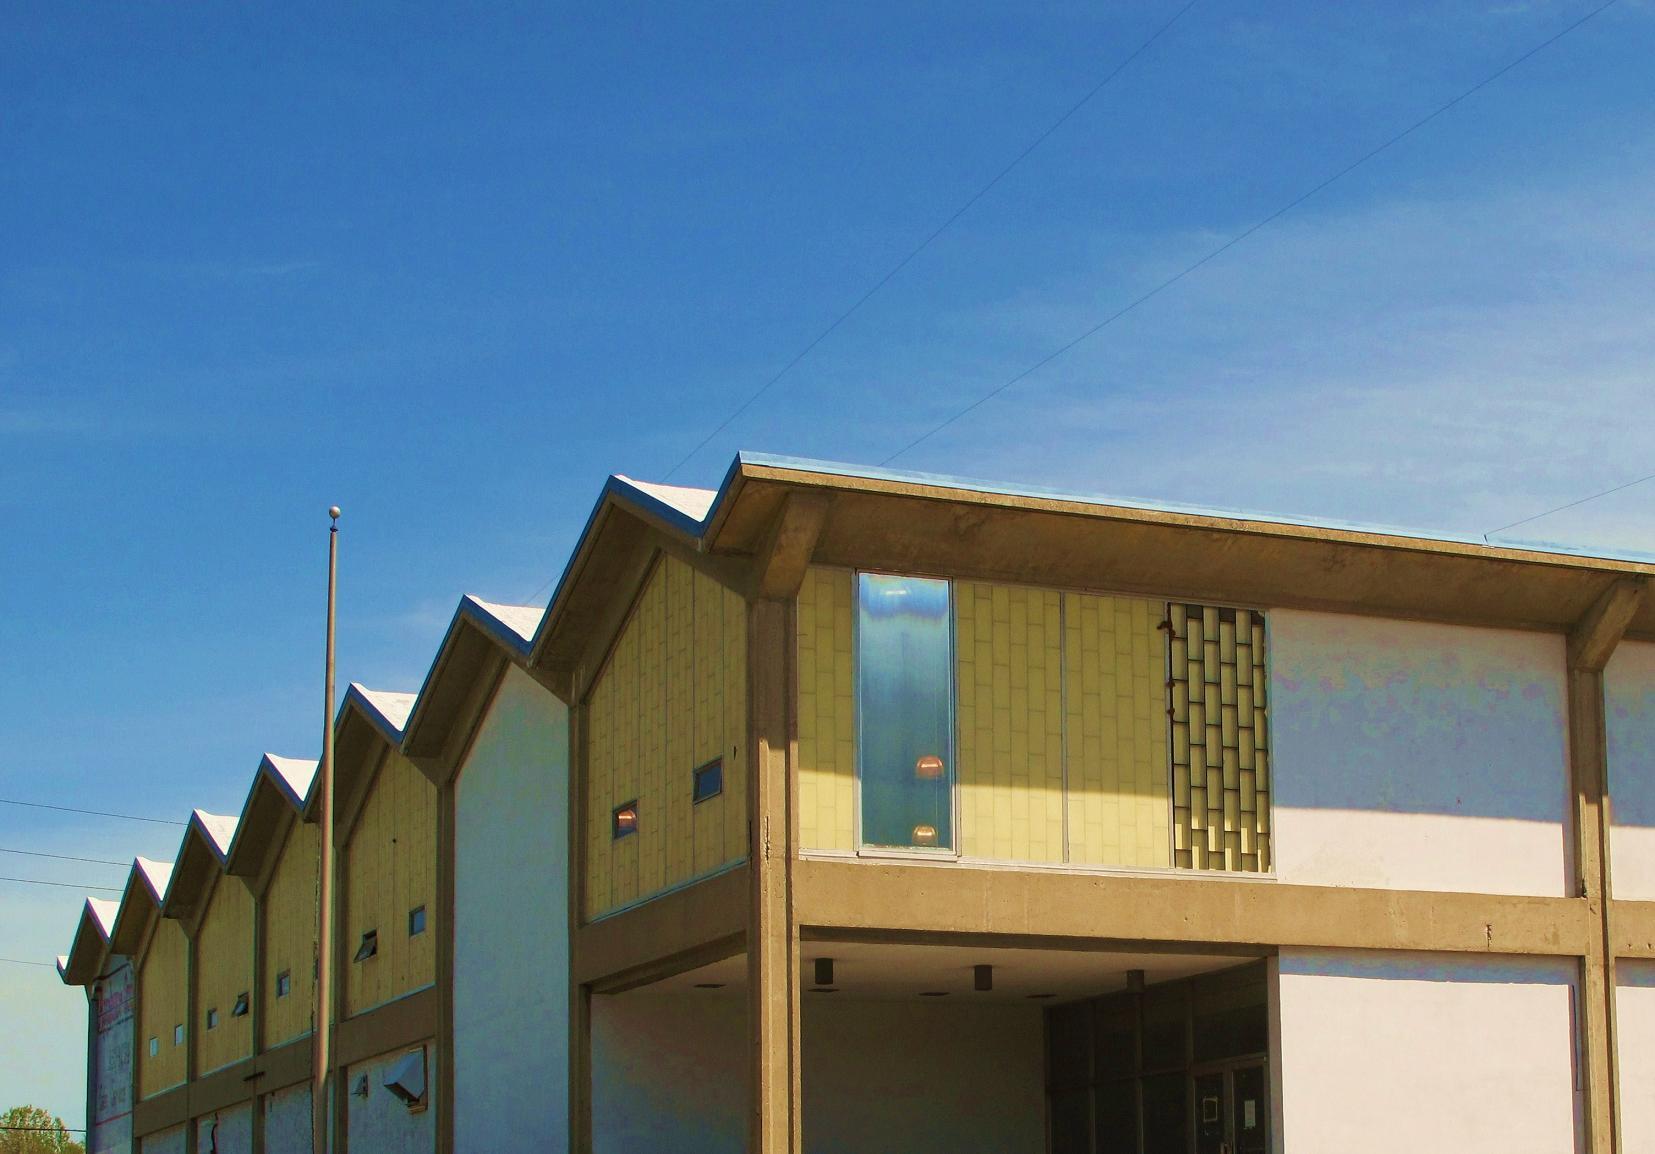 Building Language: Pleated Roof